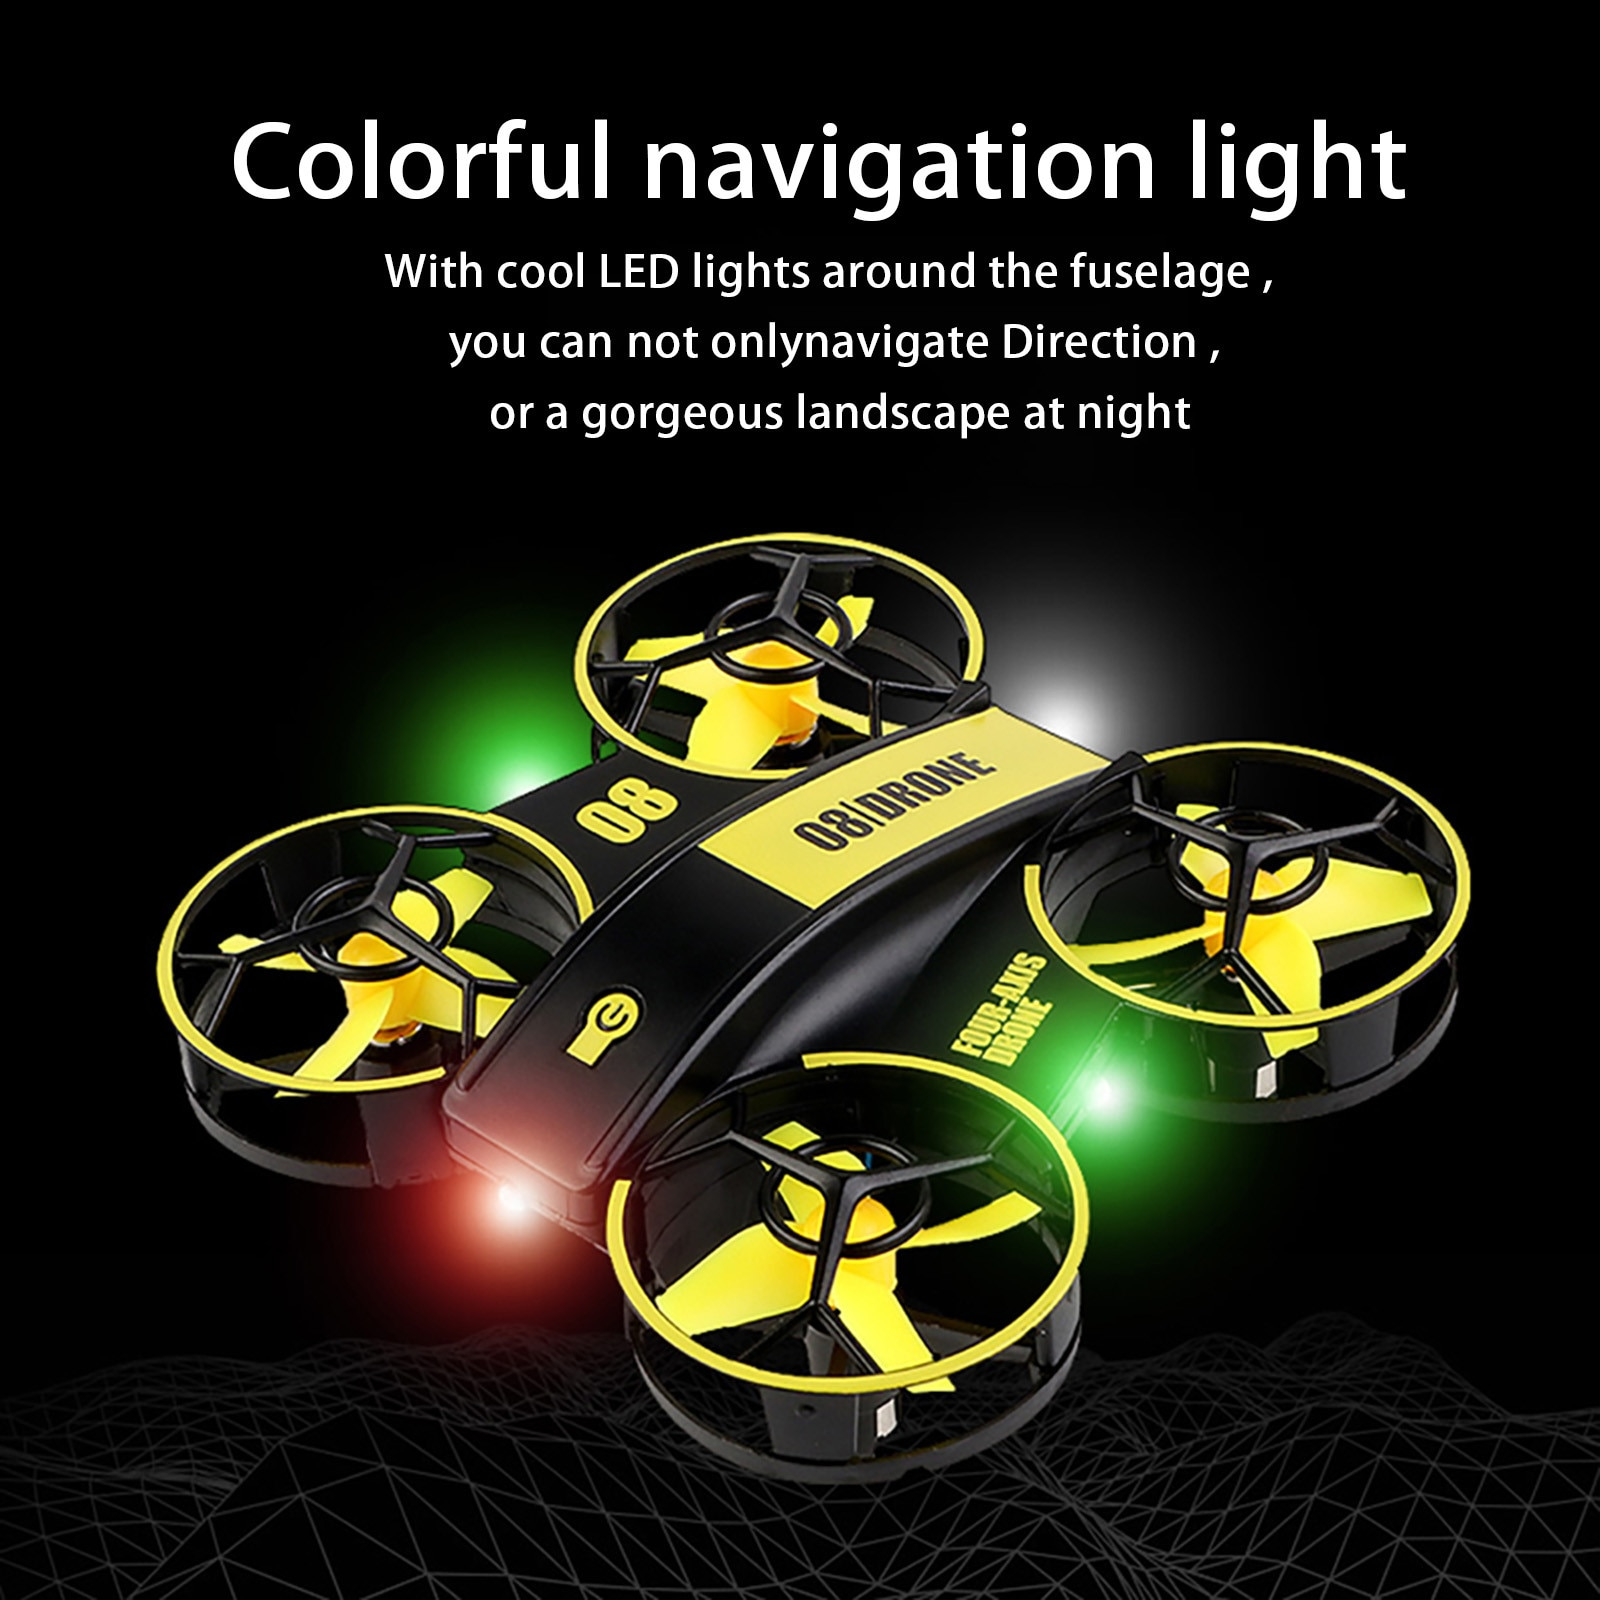 Rh821 Rc Mini Drone 2.4g 6 Axis Altitude Hold Headless Mode Rc Quadcopter Remote Control Airplane Gi